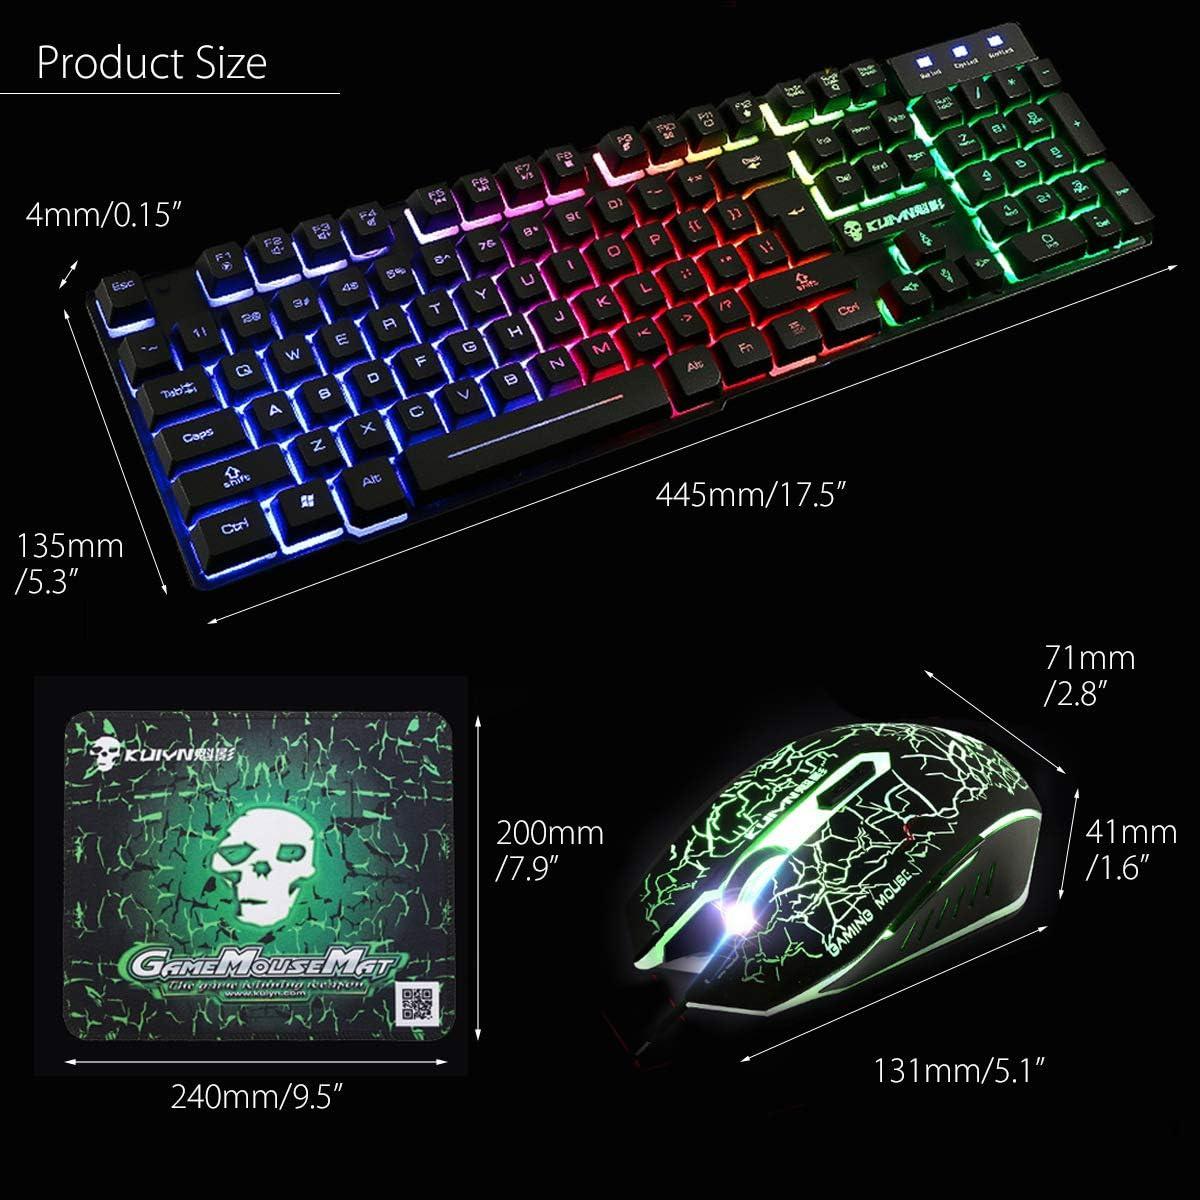 Redcolourful USB Office Rainbow Backlight Keyboard Mouse Set Mechanical for PC Laptop Desktop Gaming Stylish Ergonomic Combo Black